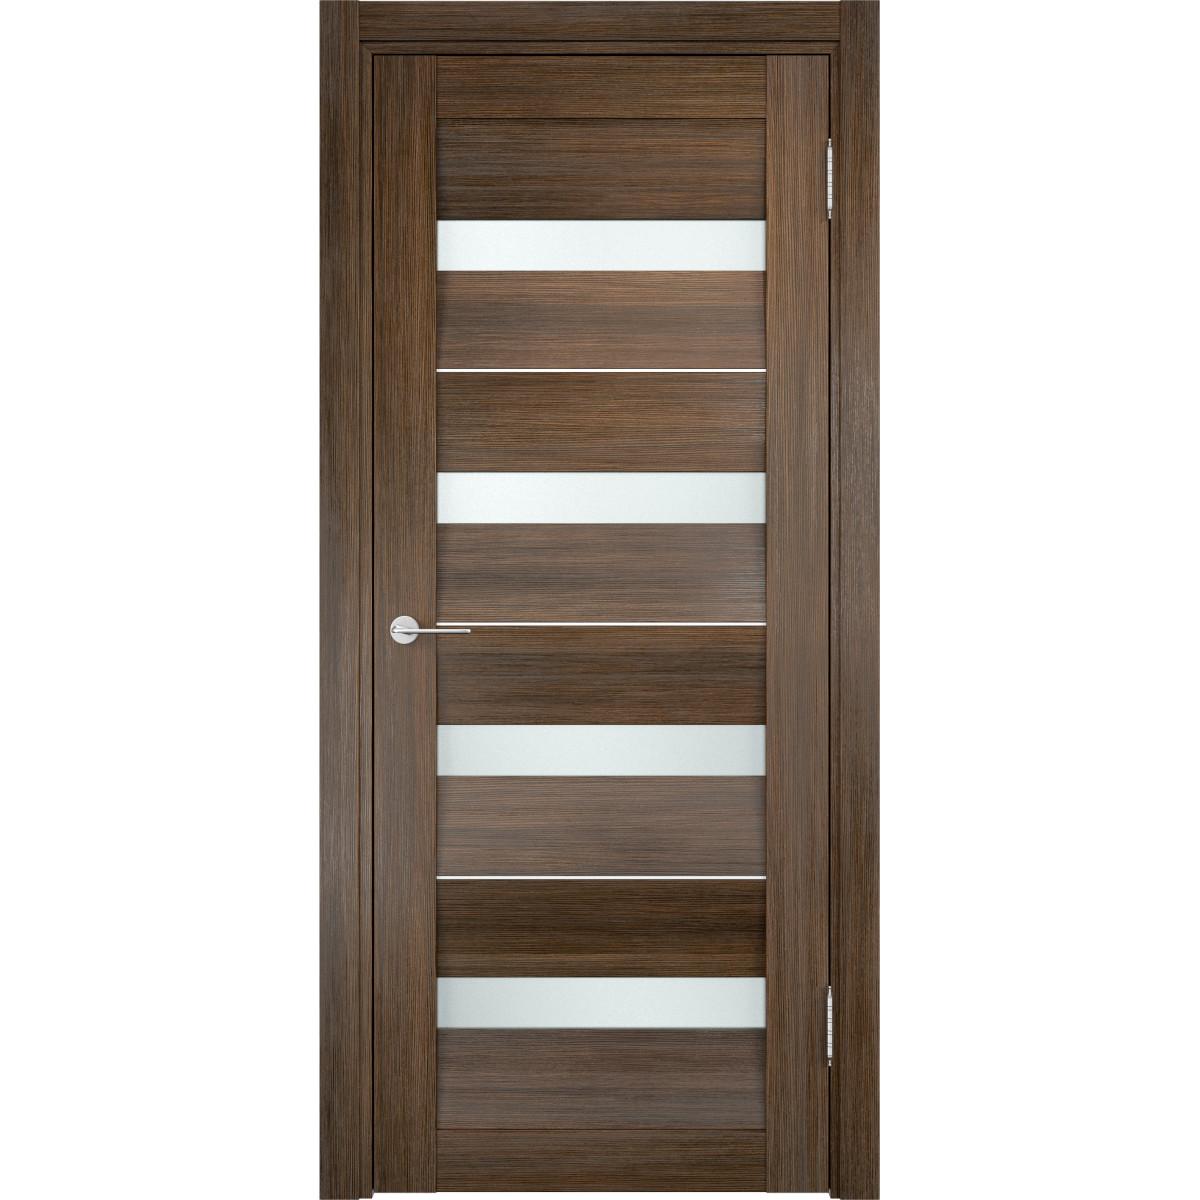 Дверное полотно Casaporte Сицилия МП_0140 2000х900х44 мм МДФ